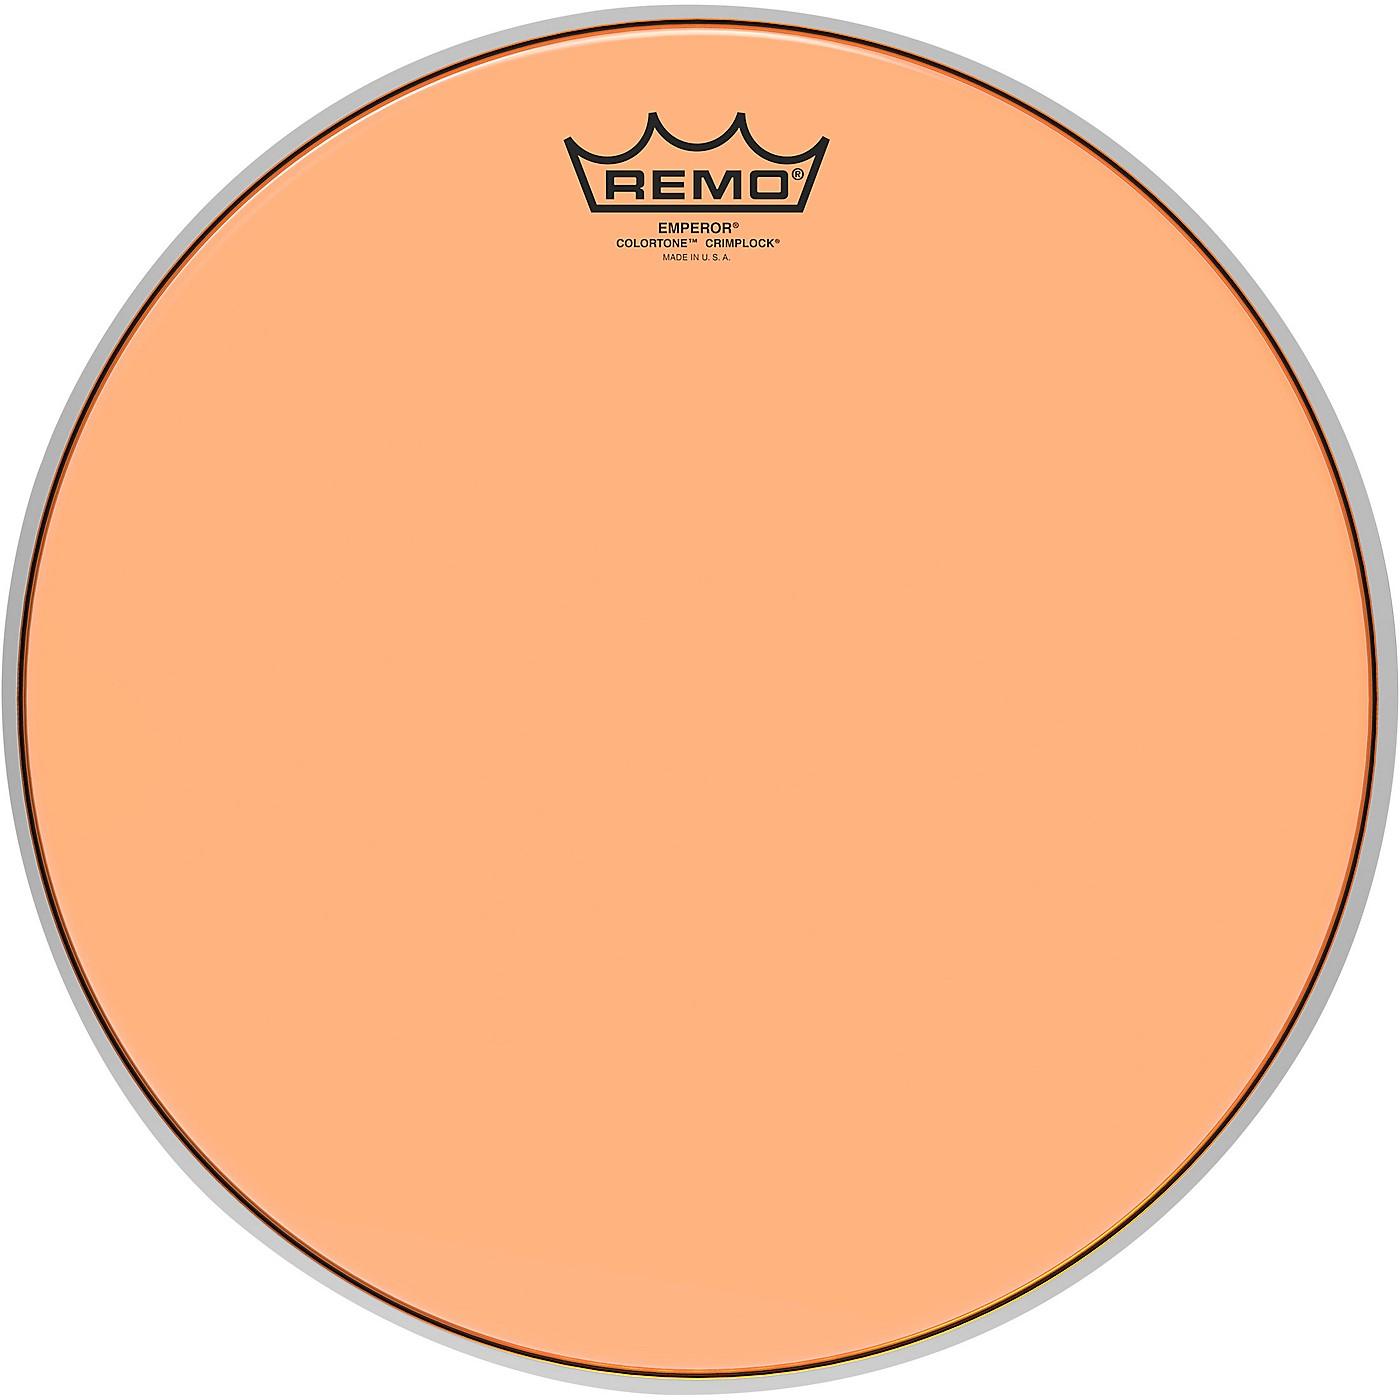 Remo Emperor Colortone Crimplock Orange Tenor Drum Head thumbnail